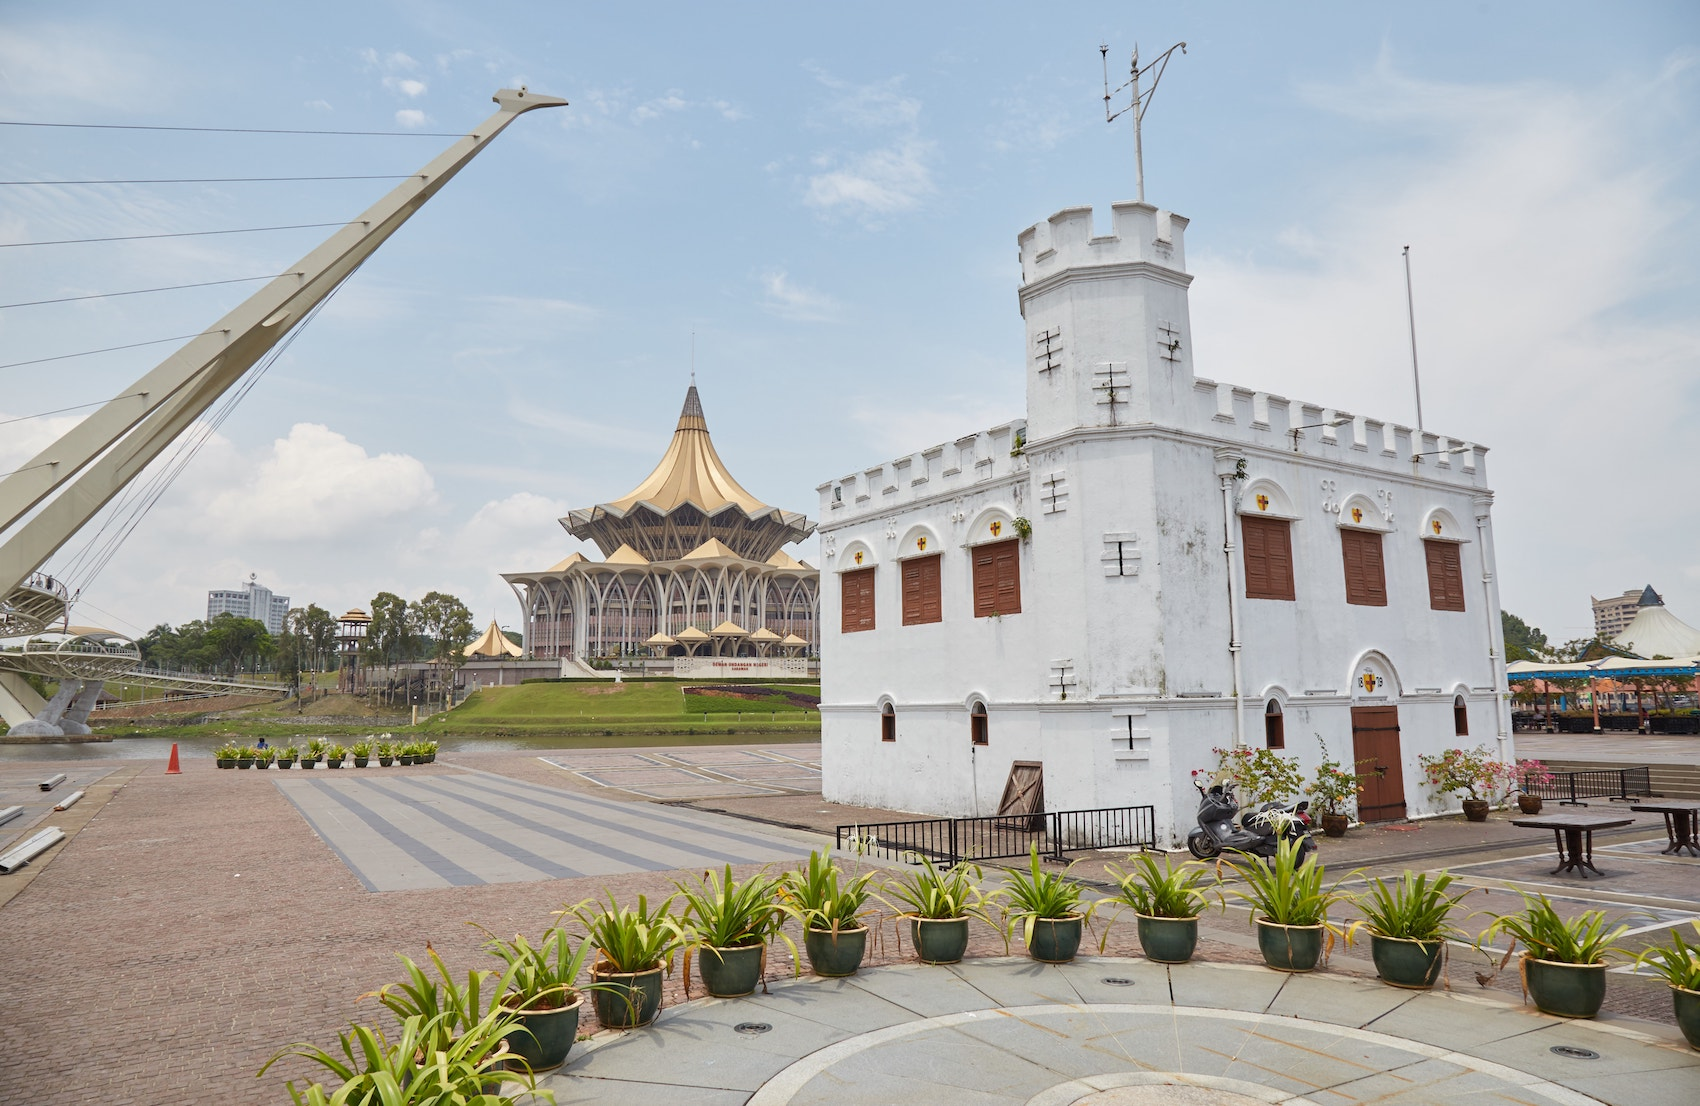 Square Tower Kuching White Rajas